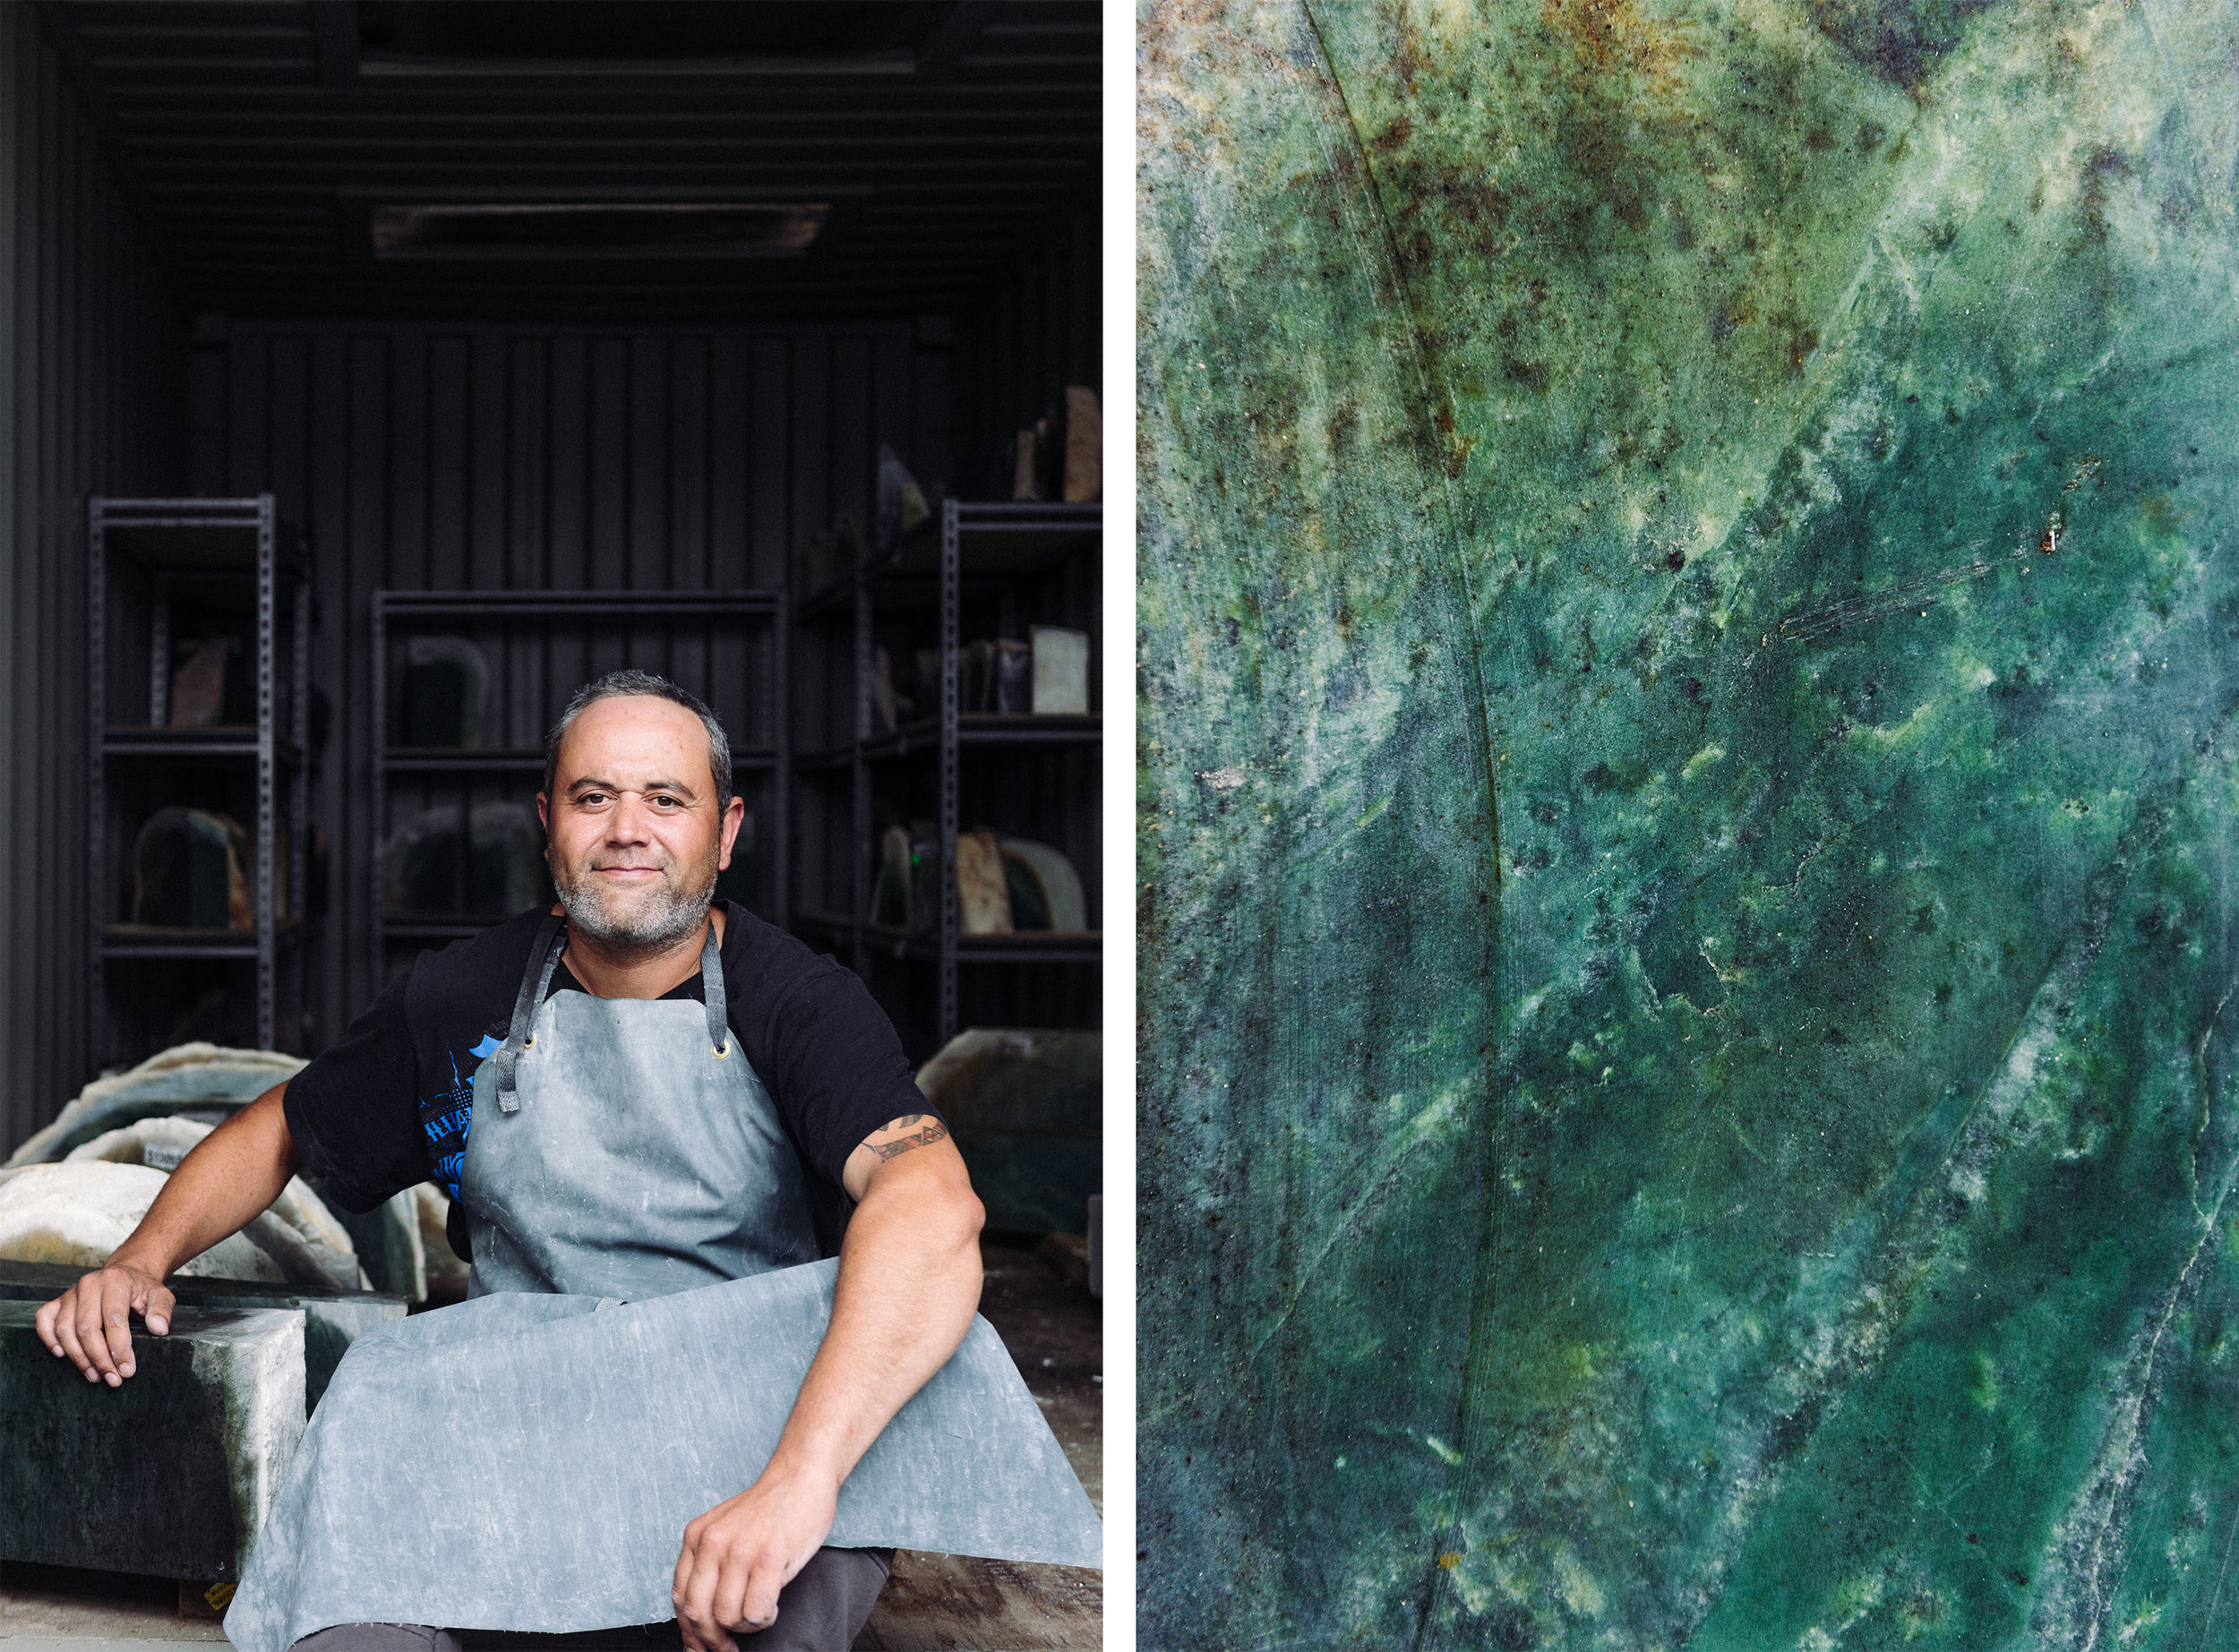 Josh-Griggs-Auckland-Food-and-Lifestyle-Photographer-2018-Split-#4.jpg